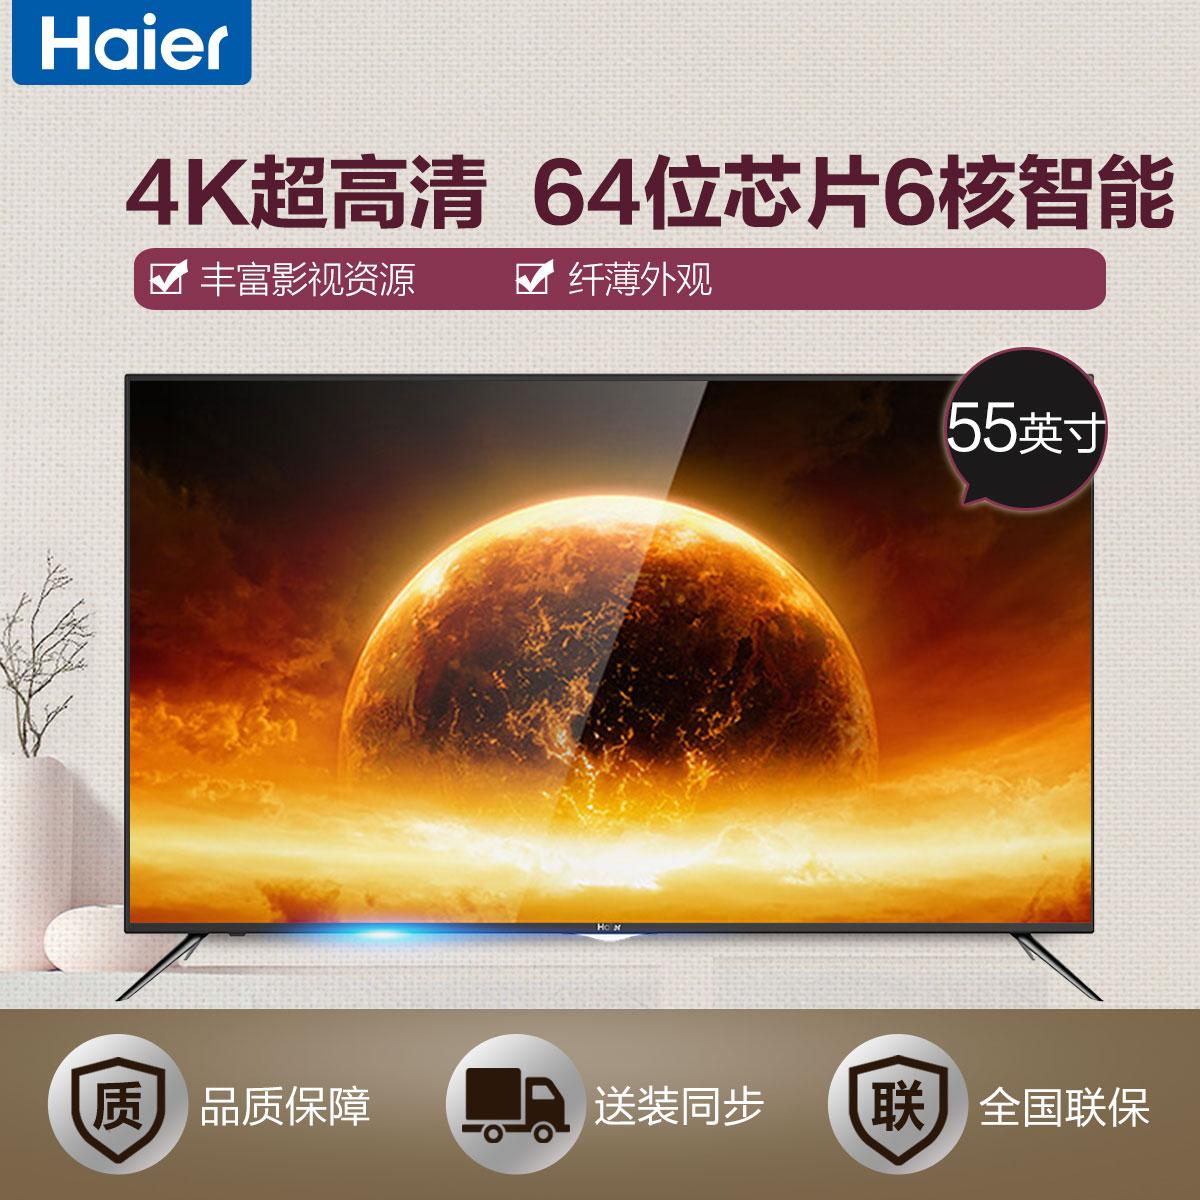 Haier/海尔             4K电视             LS55H610X